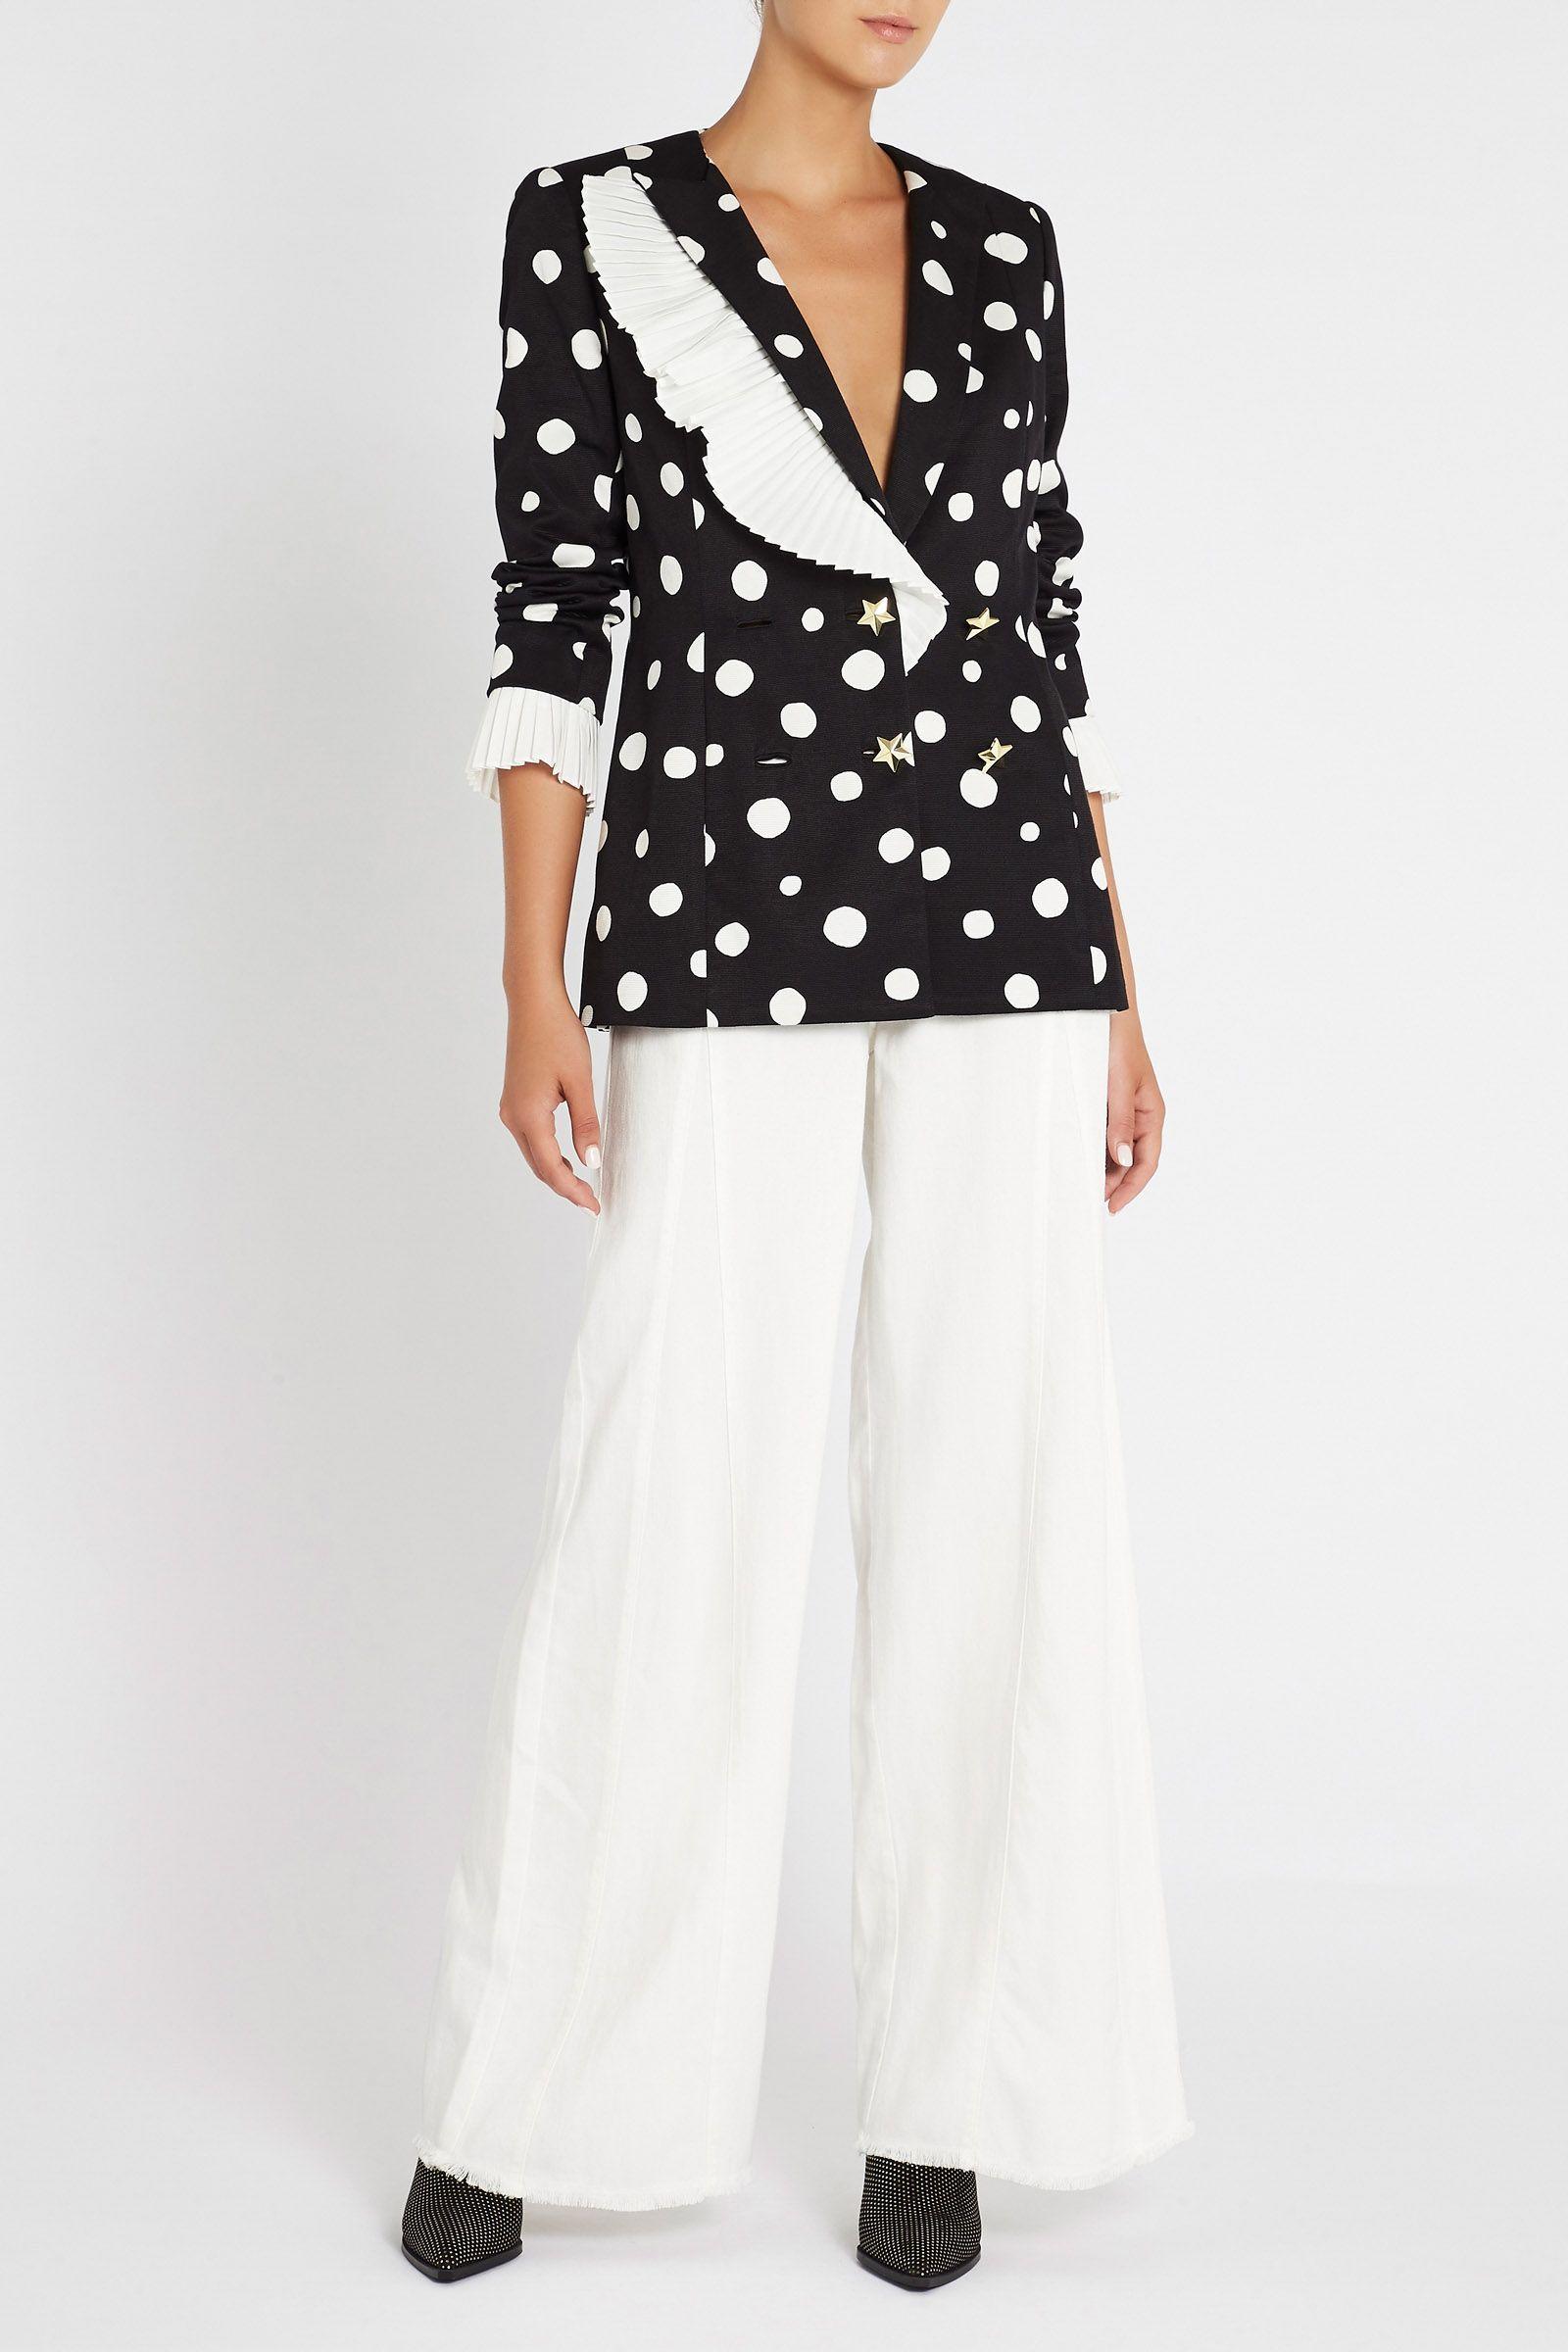 La Vagabonde Jacket Sass Bide Tailored Blazer Sassandbide Flare Maxi Skirt Frill Tops Tailored Blazer